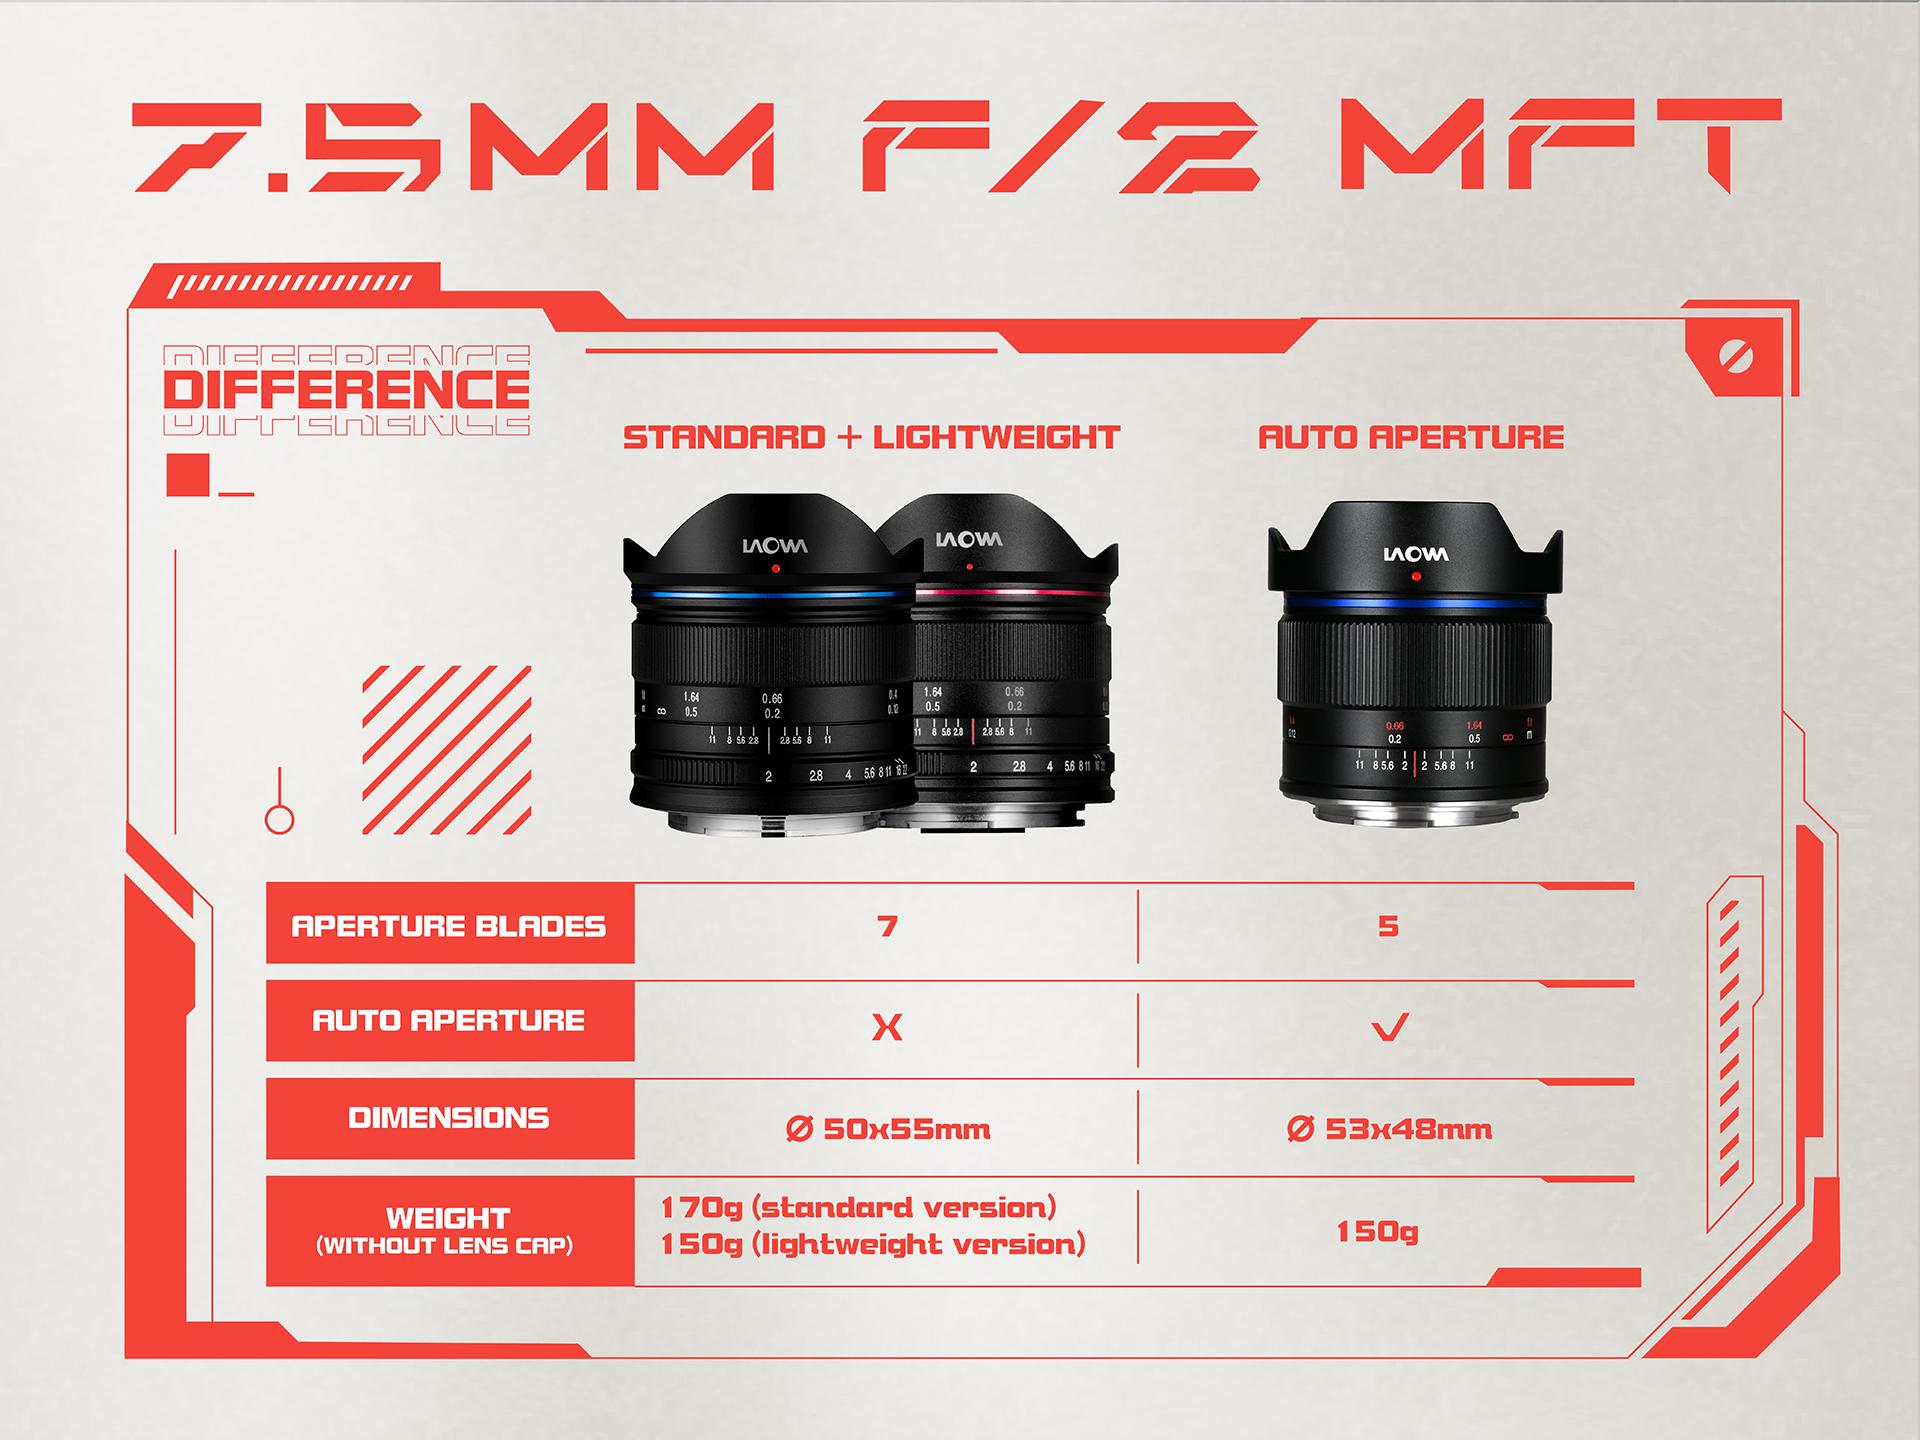 7.5 F2 MFT Comparison